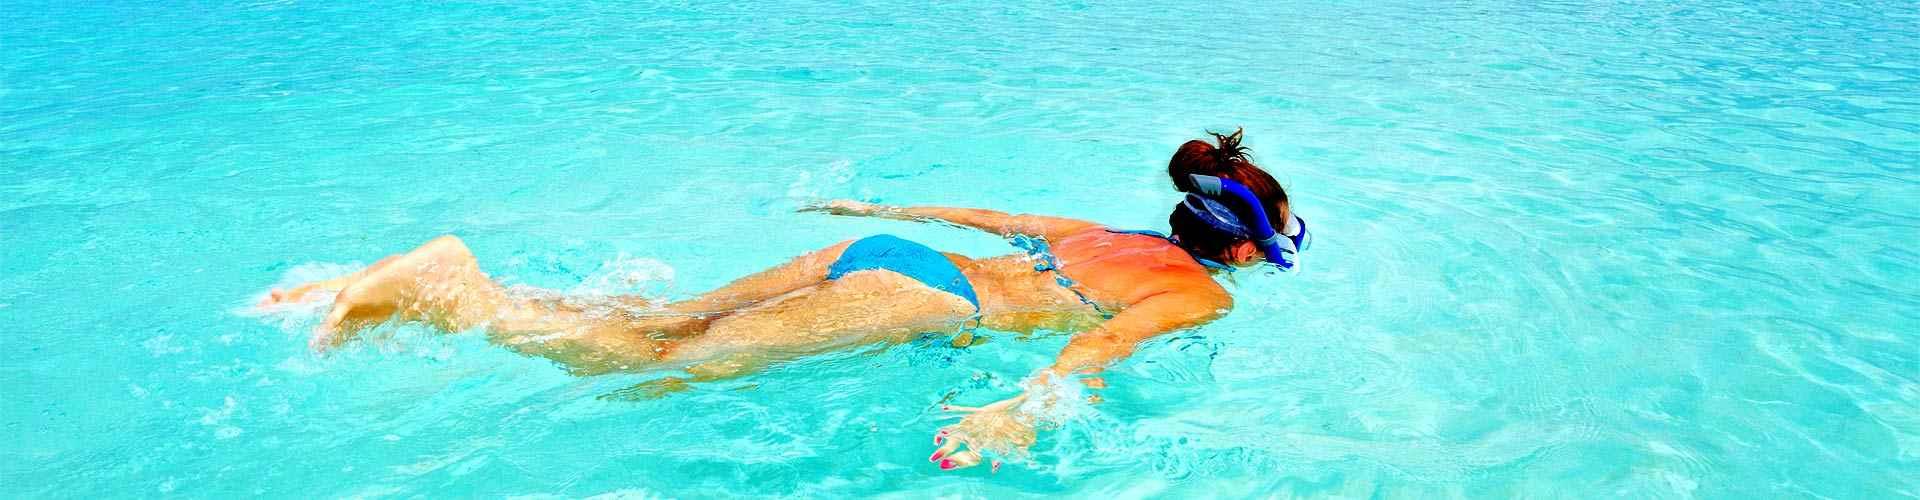 snorkel en centrosdeportes de Tossa de Mar